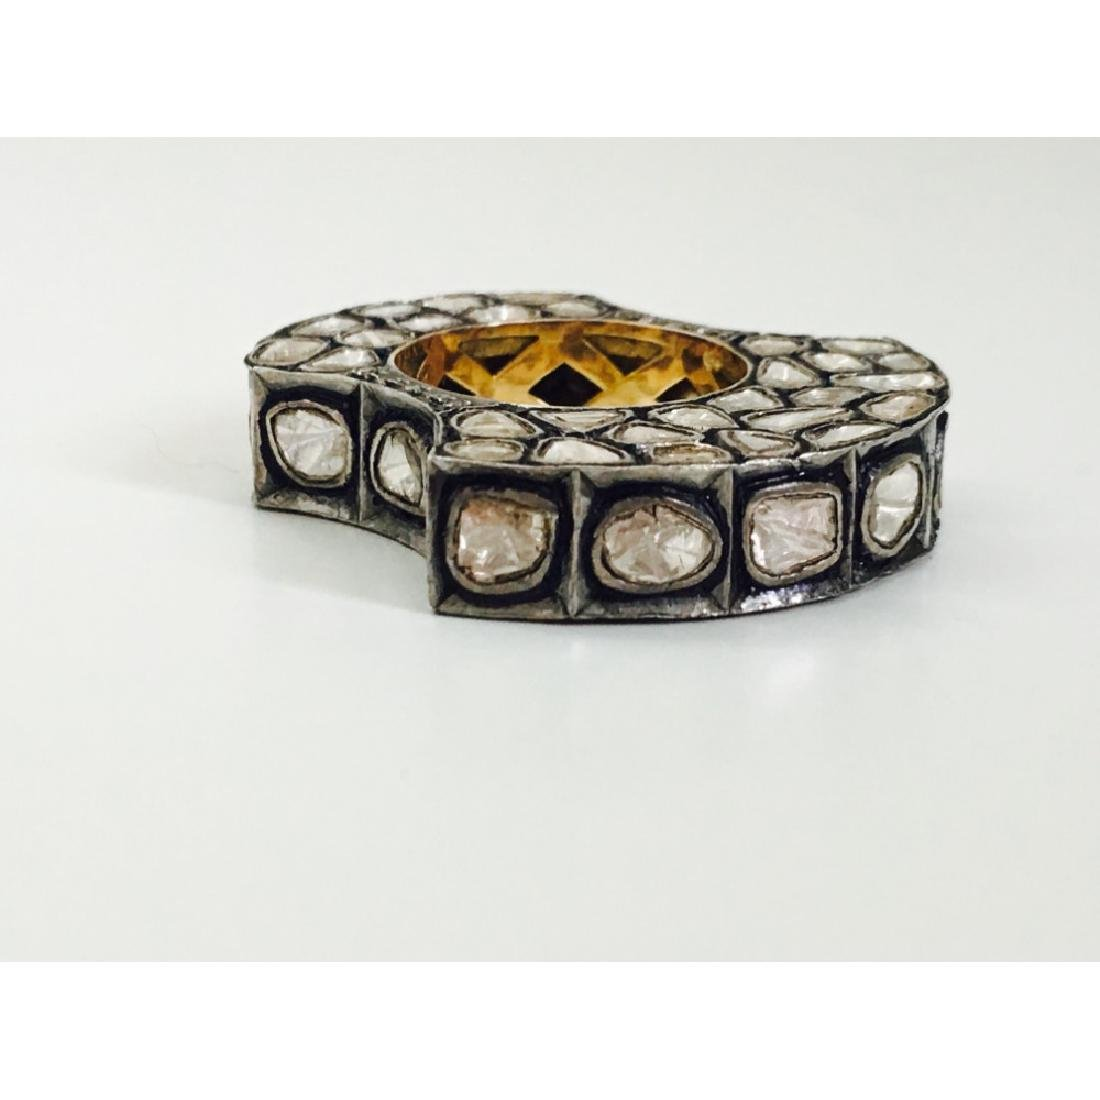 4.70ct Rose Cut Diamond Pave. 14K gold Ring - 4